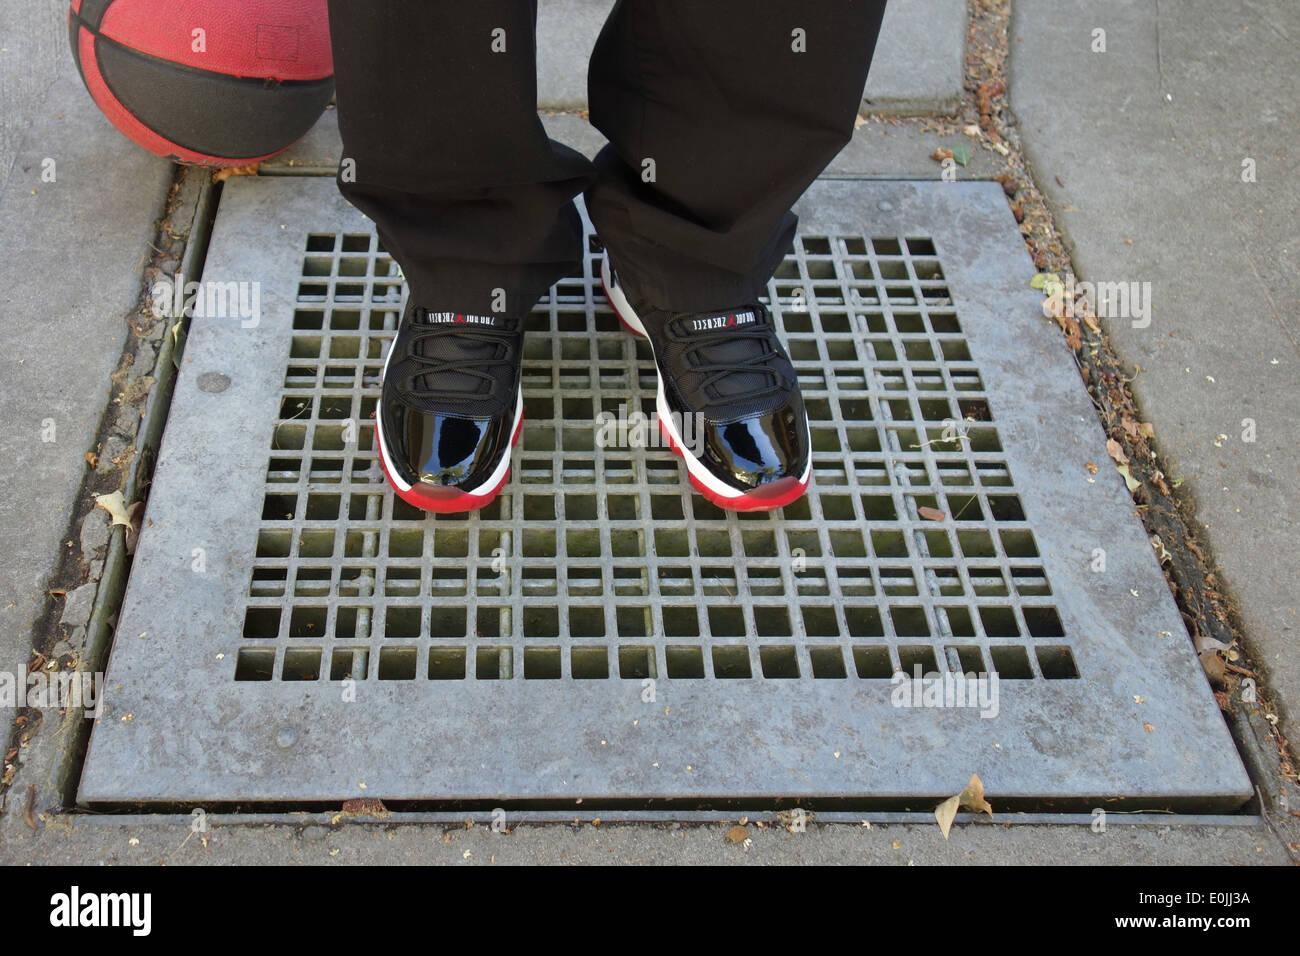 official photos 79098 fc2a5 Nike Air Jordan Retro 11 XI (negro y rojo). Imagen De Stock